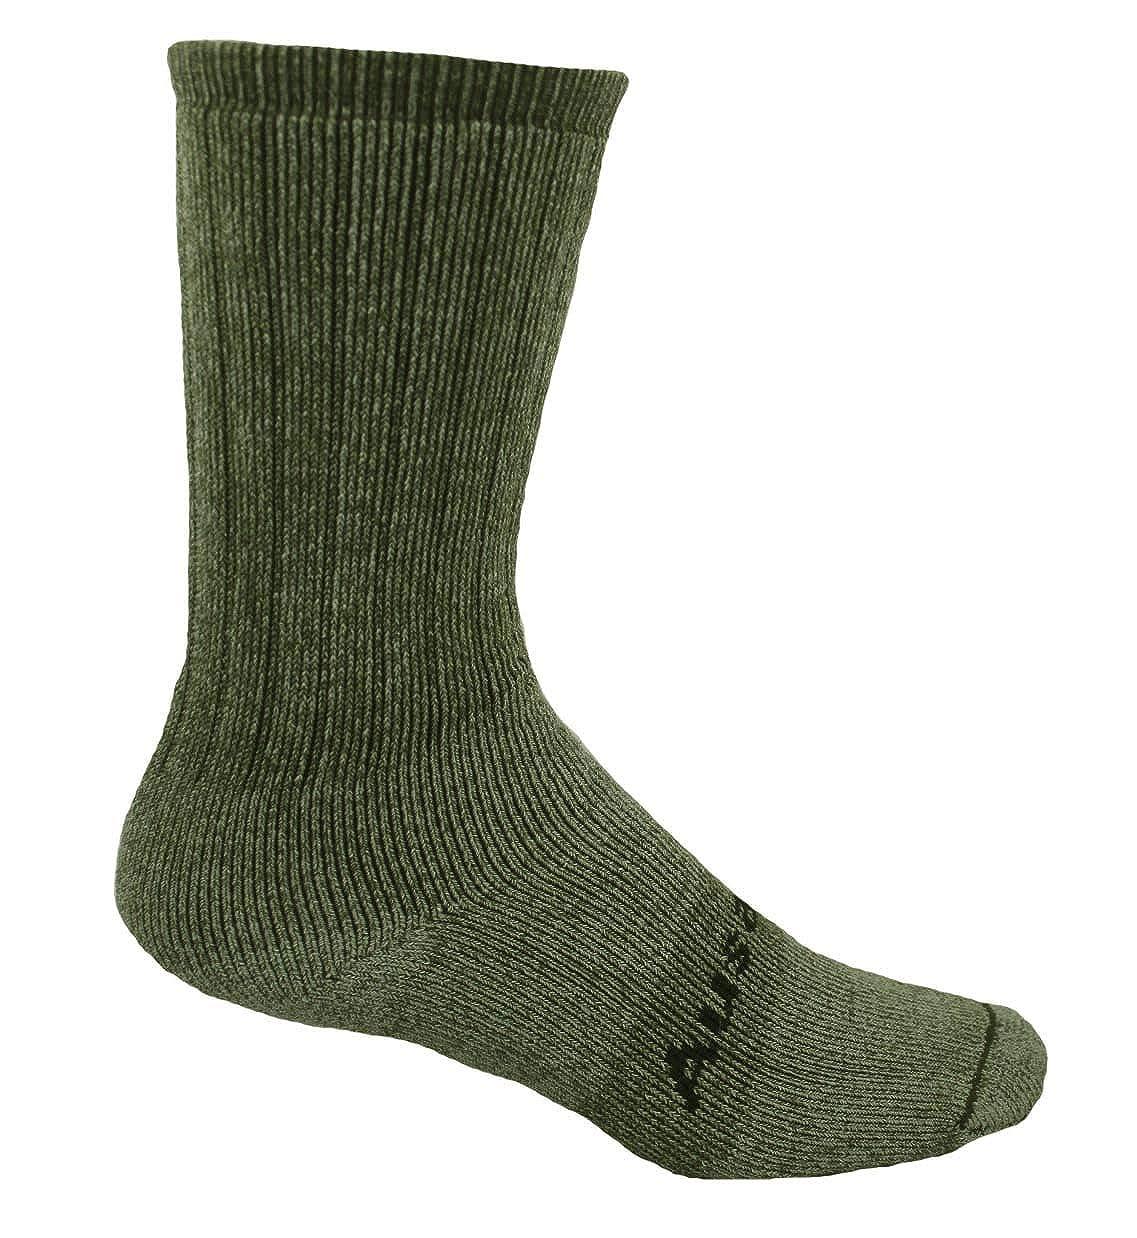 Ausangate Alpacor Medium Weight Hiking Socks For Men